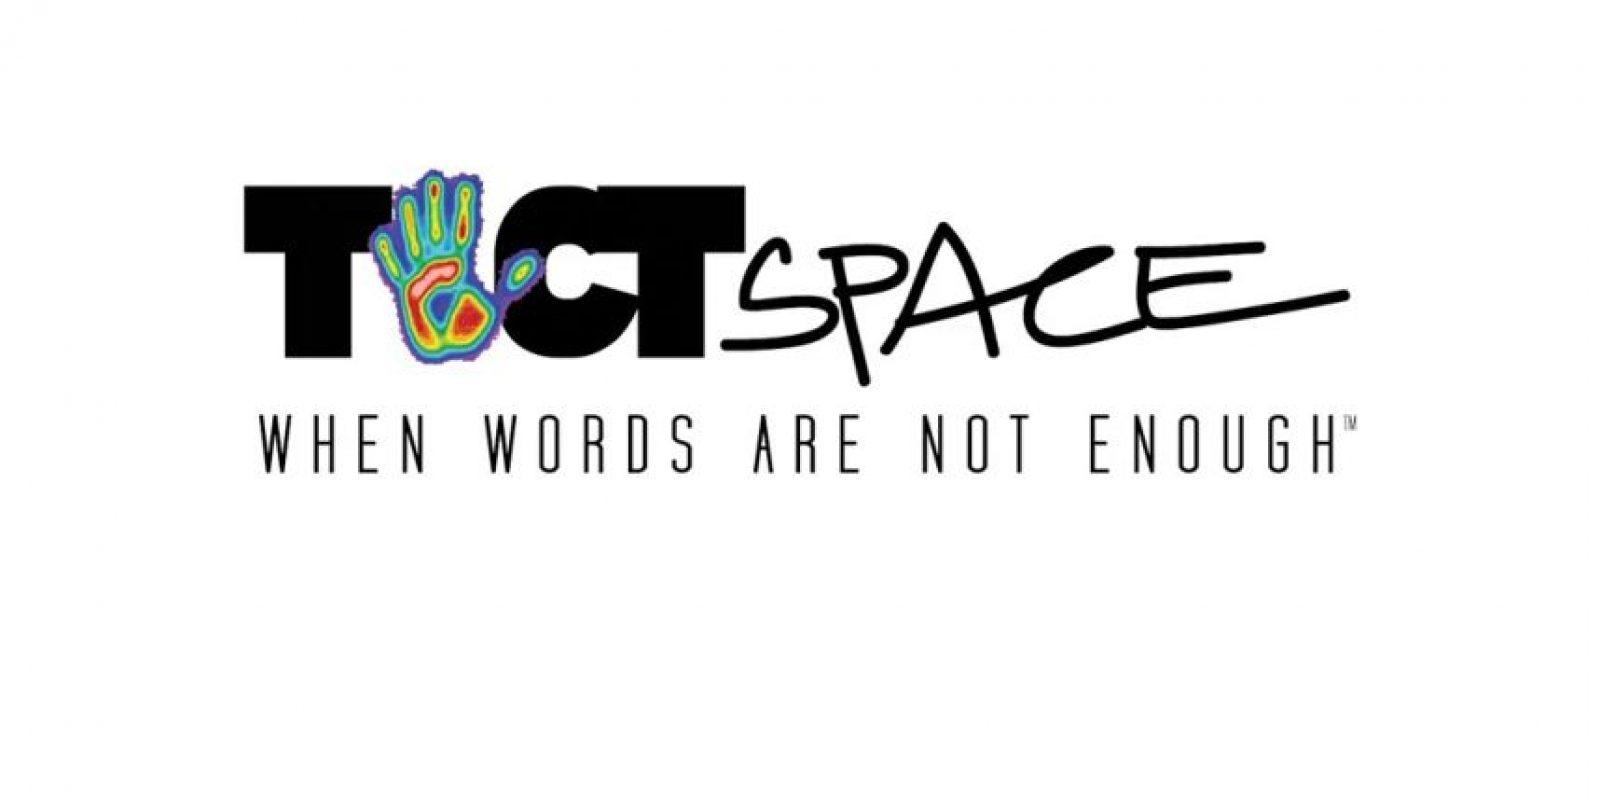 Foto:TACTspace